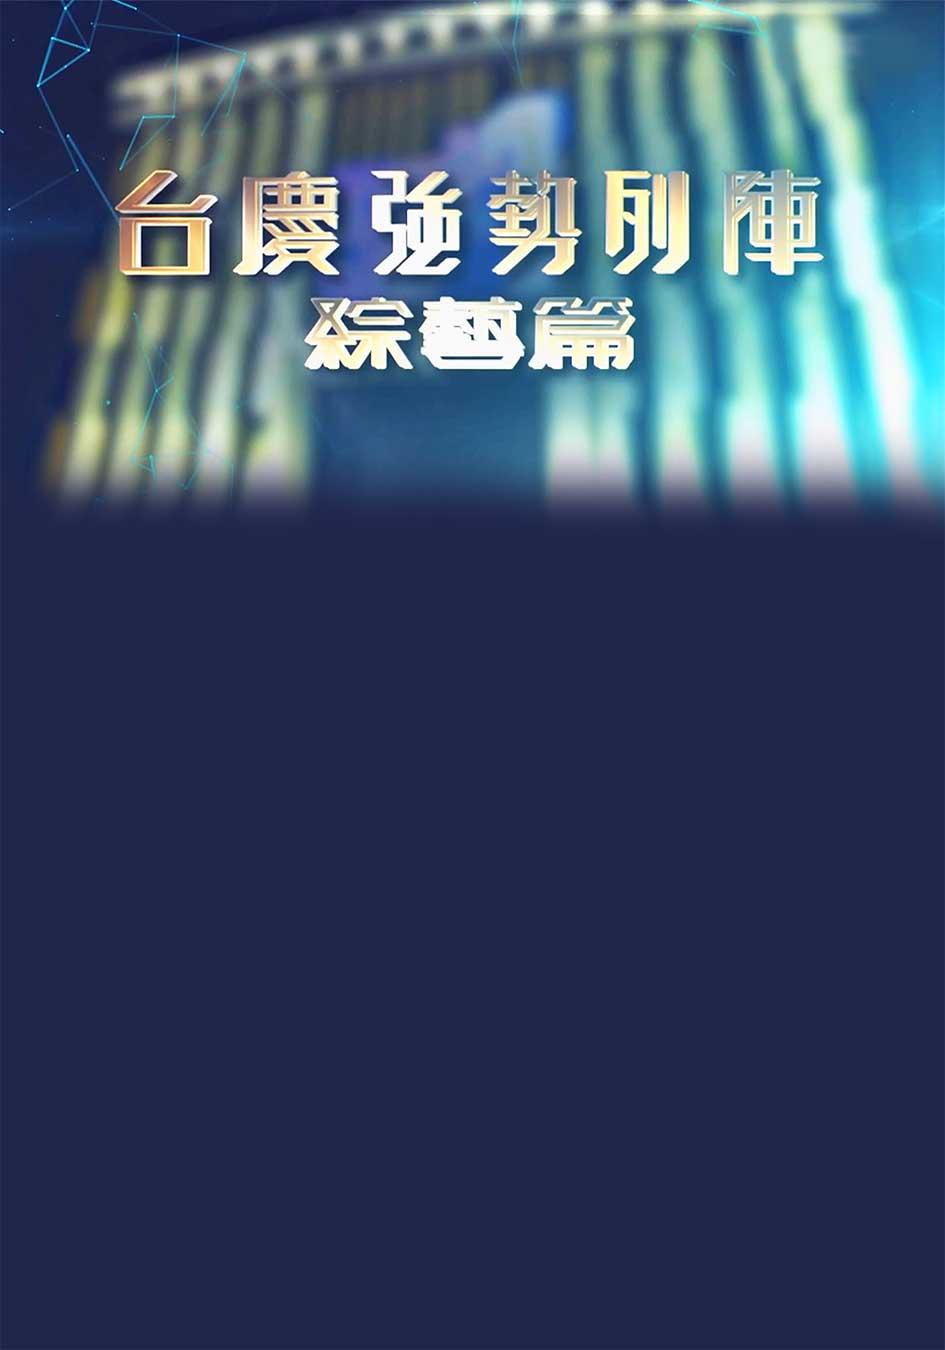 台慶強勢列陣-Anniversary Programme Presentation 2019